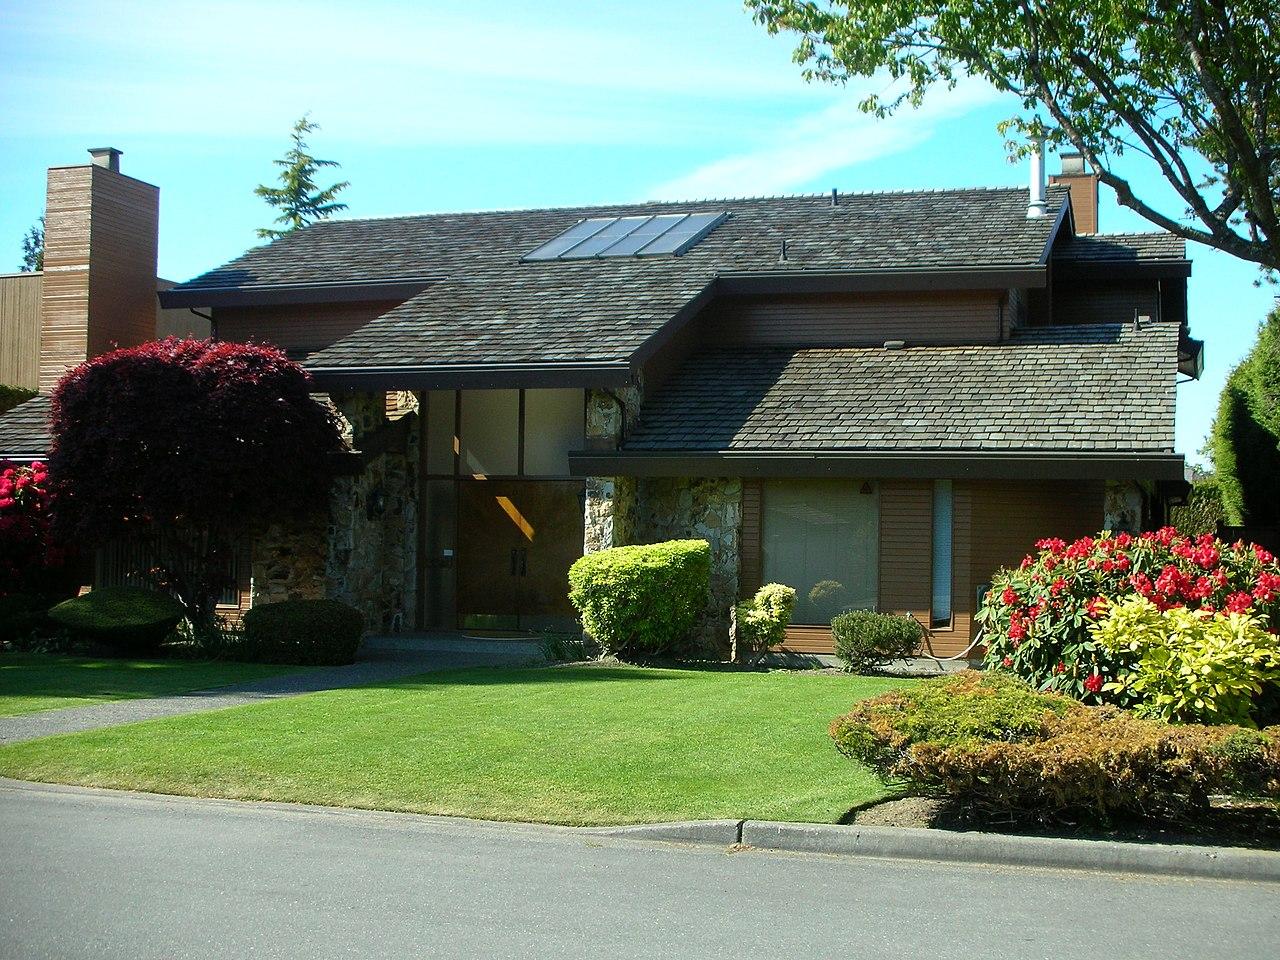 File:Contemporary Home In Richmond, BC.JPG